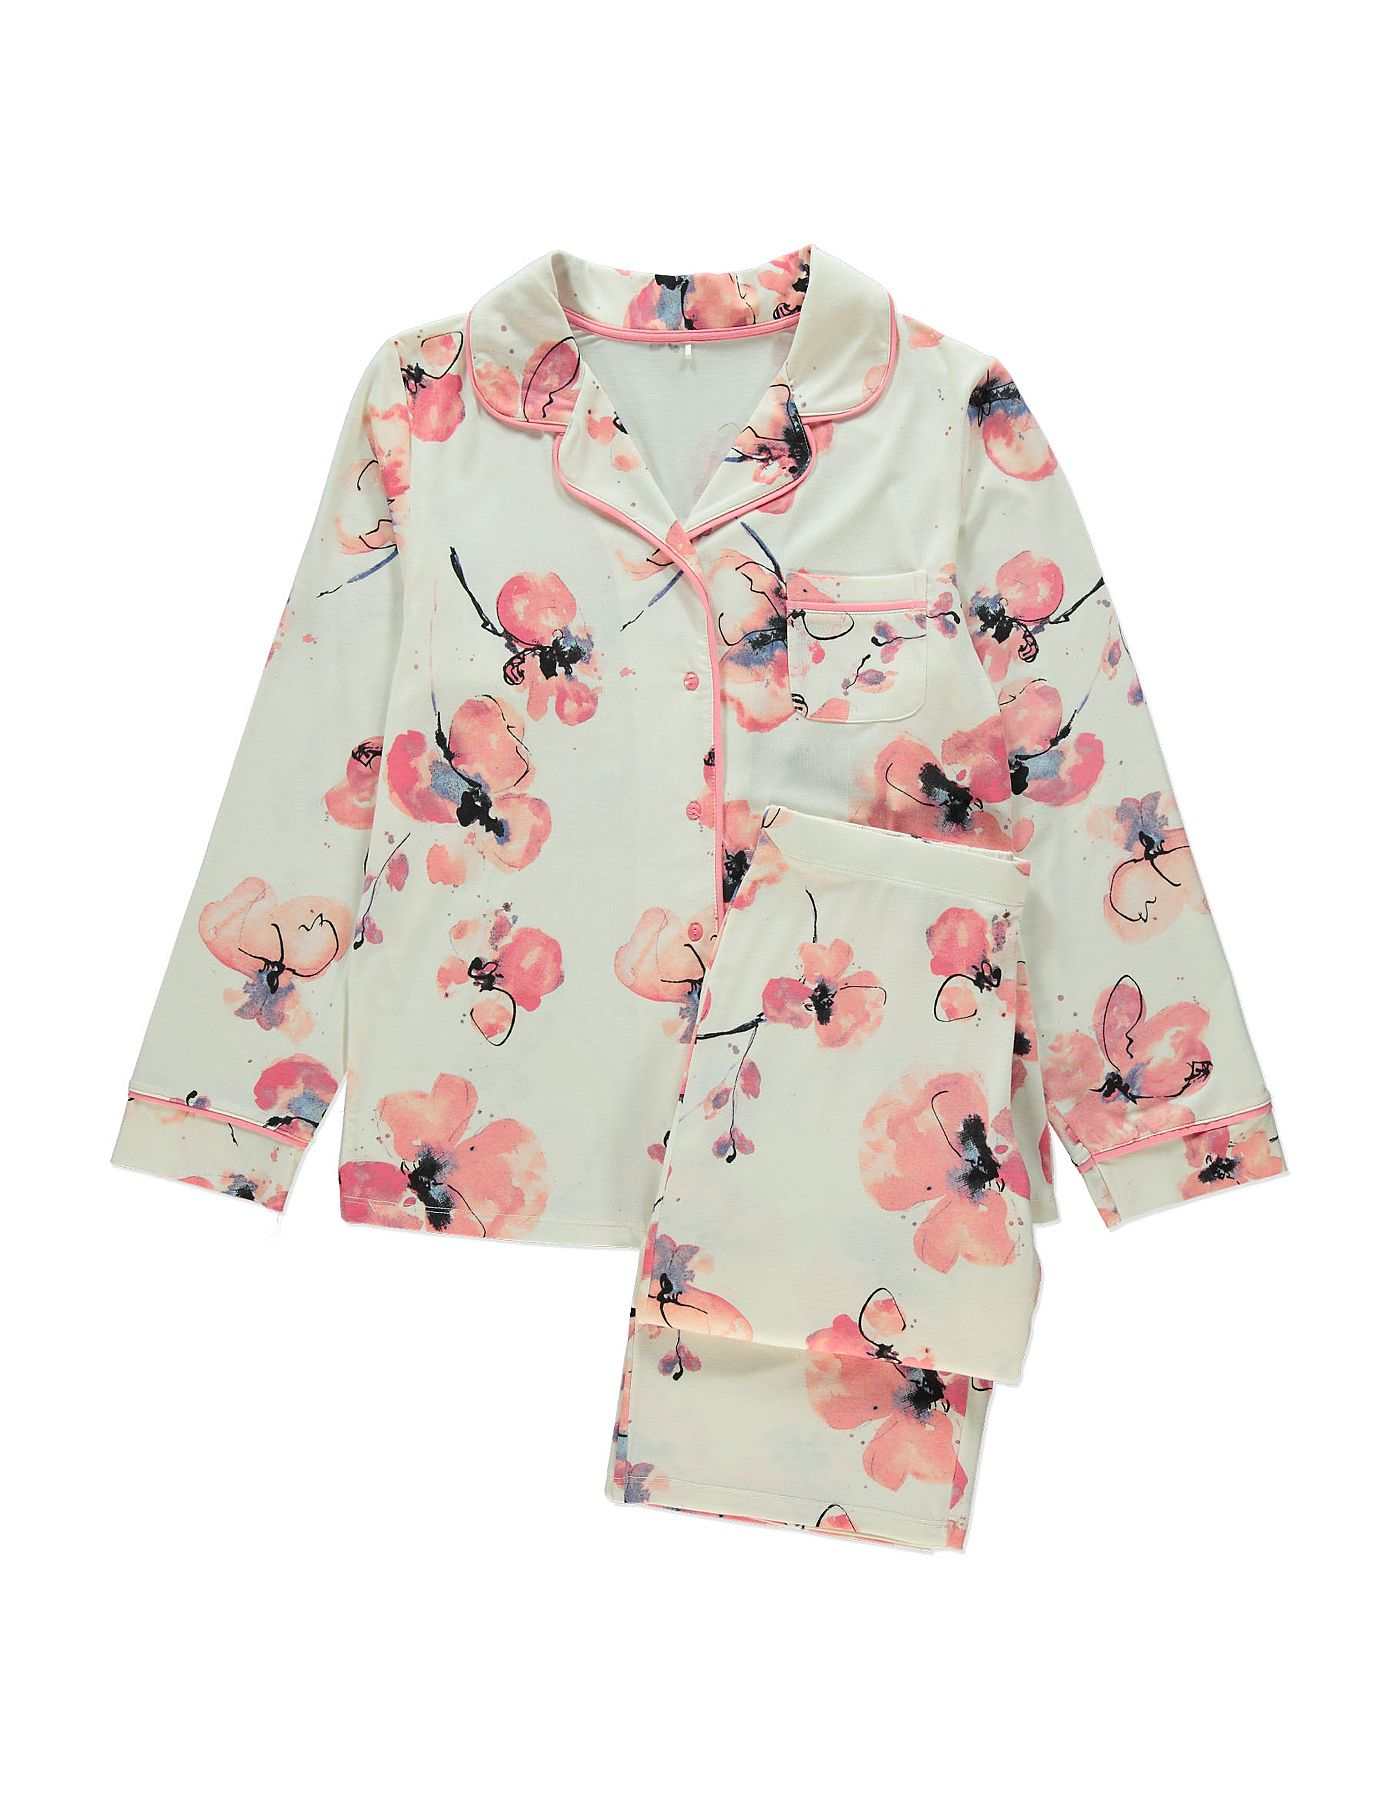 Floral Print Pyjamas Women at ASDA Pajamas